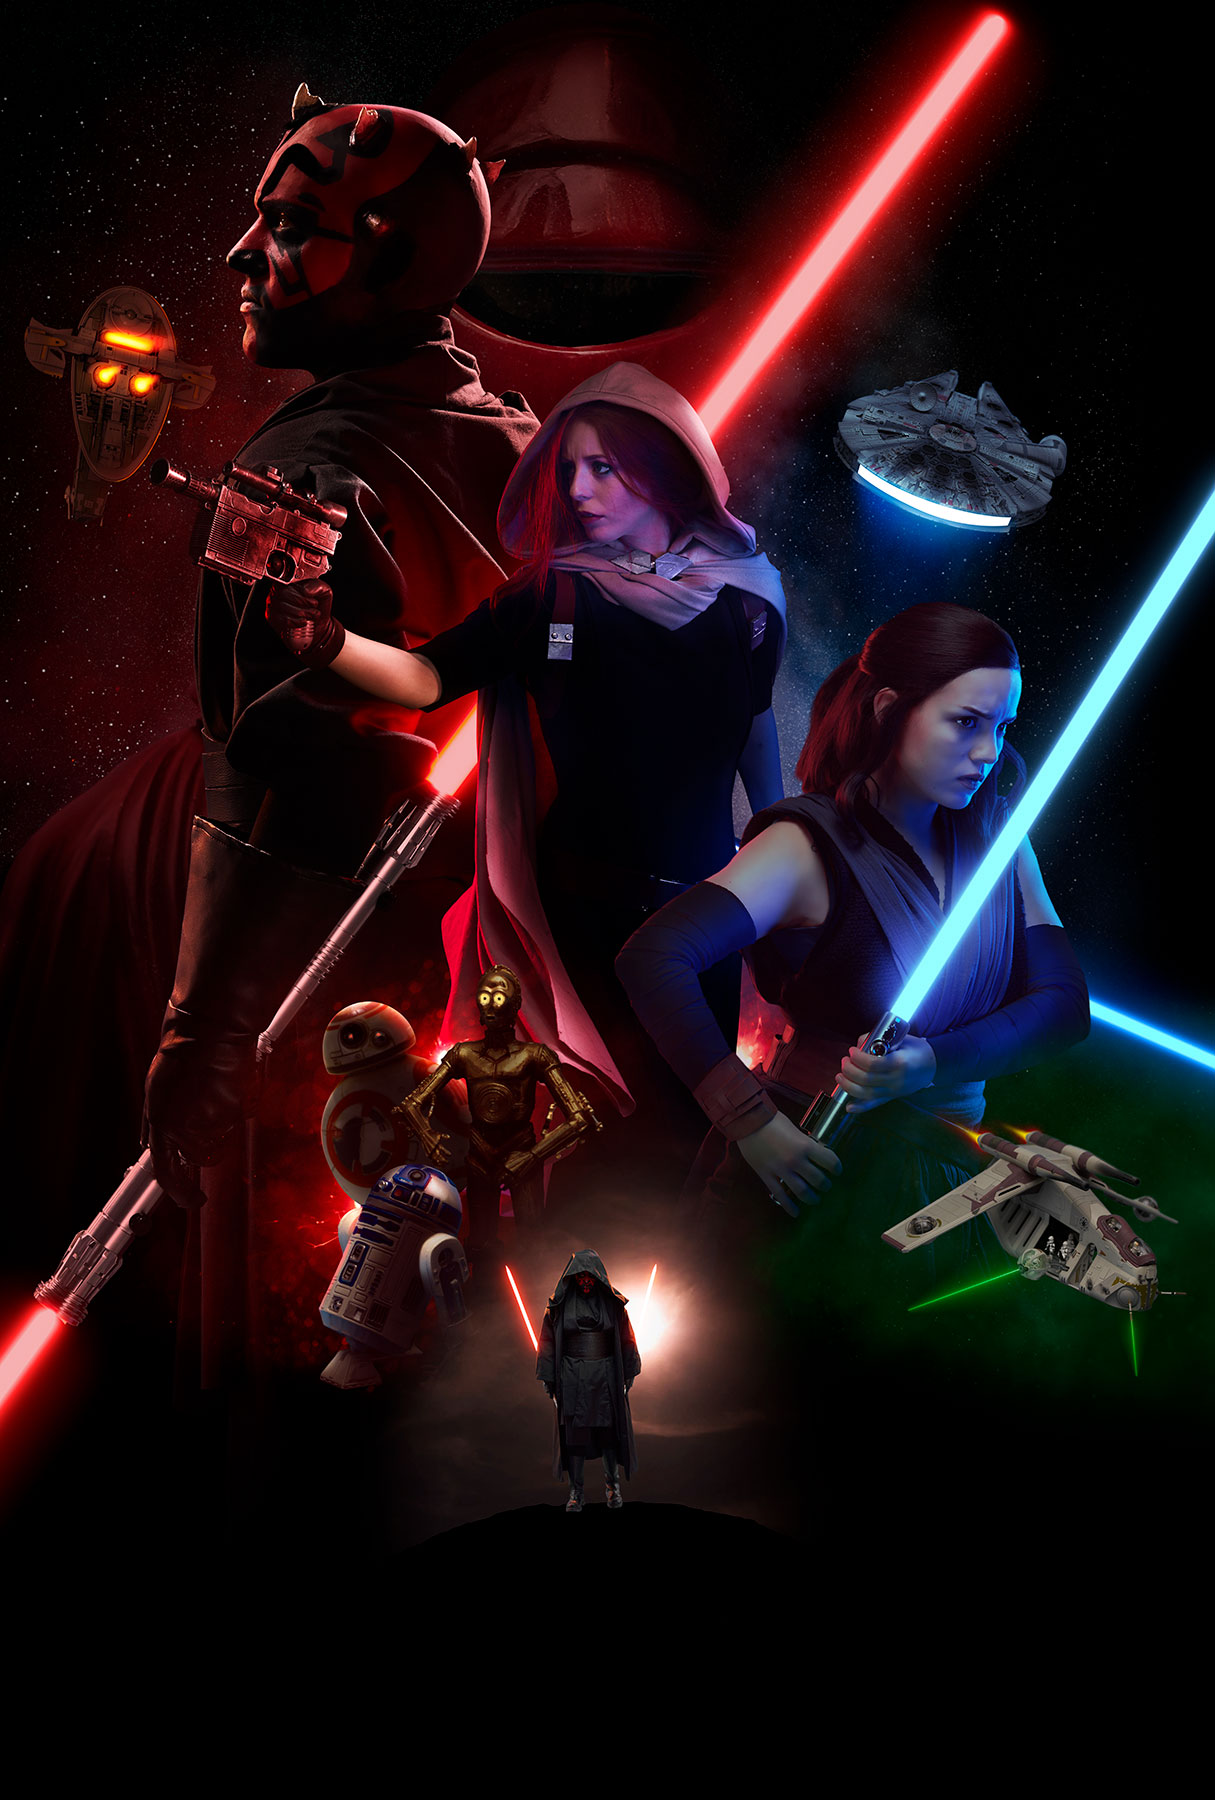 Sayanoff Arthur Star Wars Poster 02 12